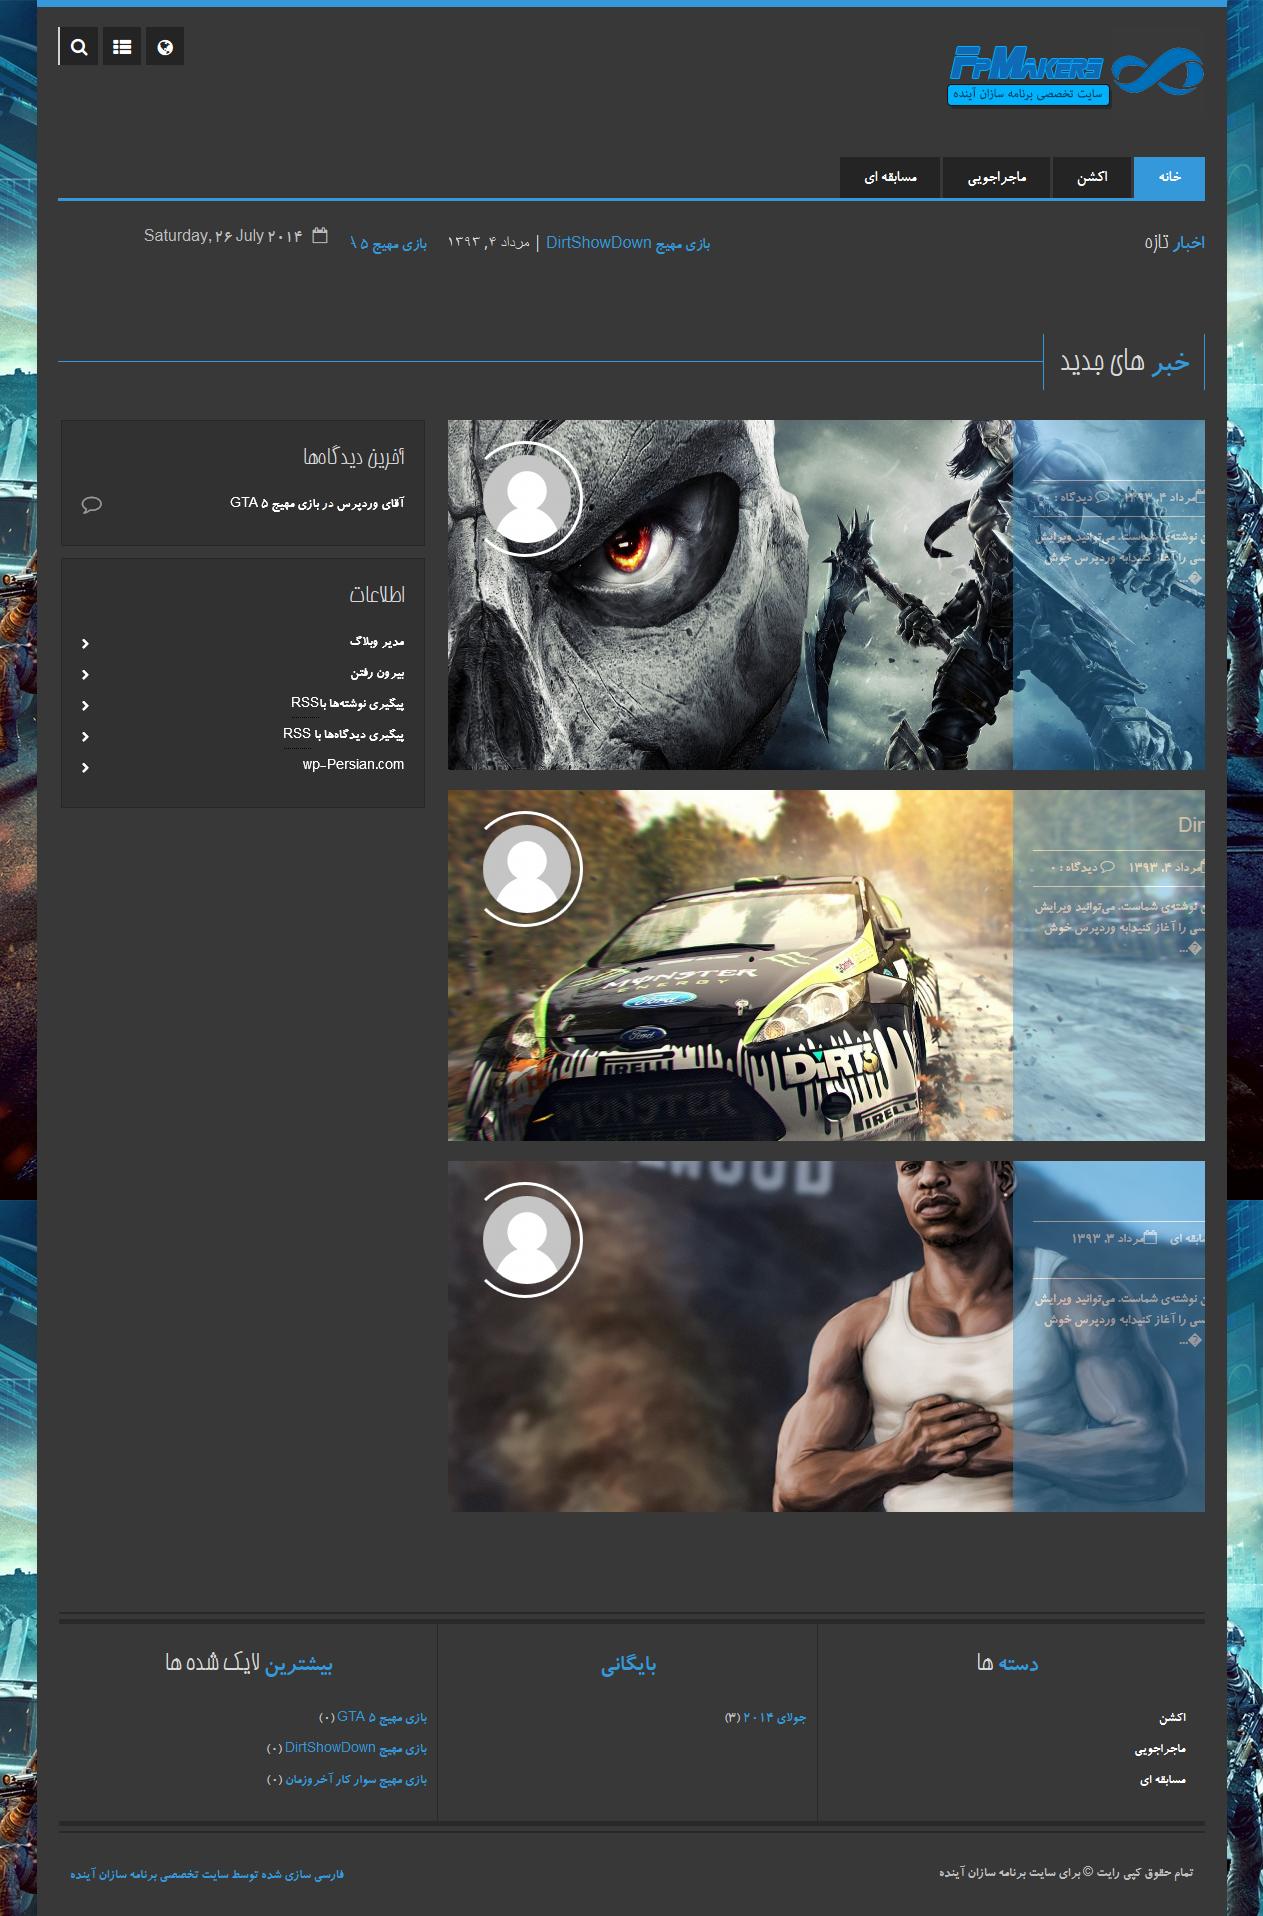 FireShot Pro Screen Capture #052 - 'برنامه سازان آینده I یک سایت دیگر با وردپرس فارسی' - localhost_wordpress_#